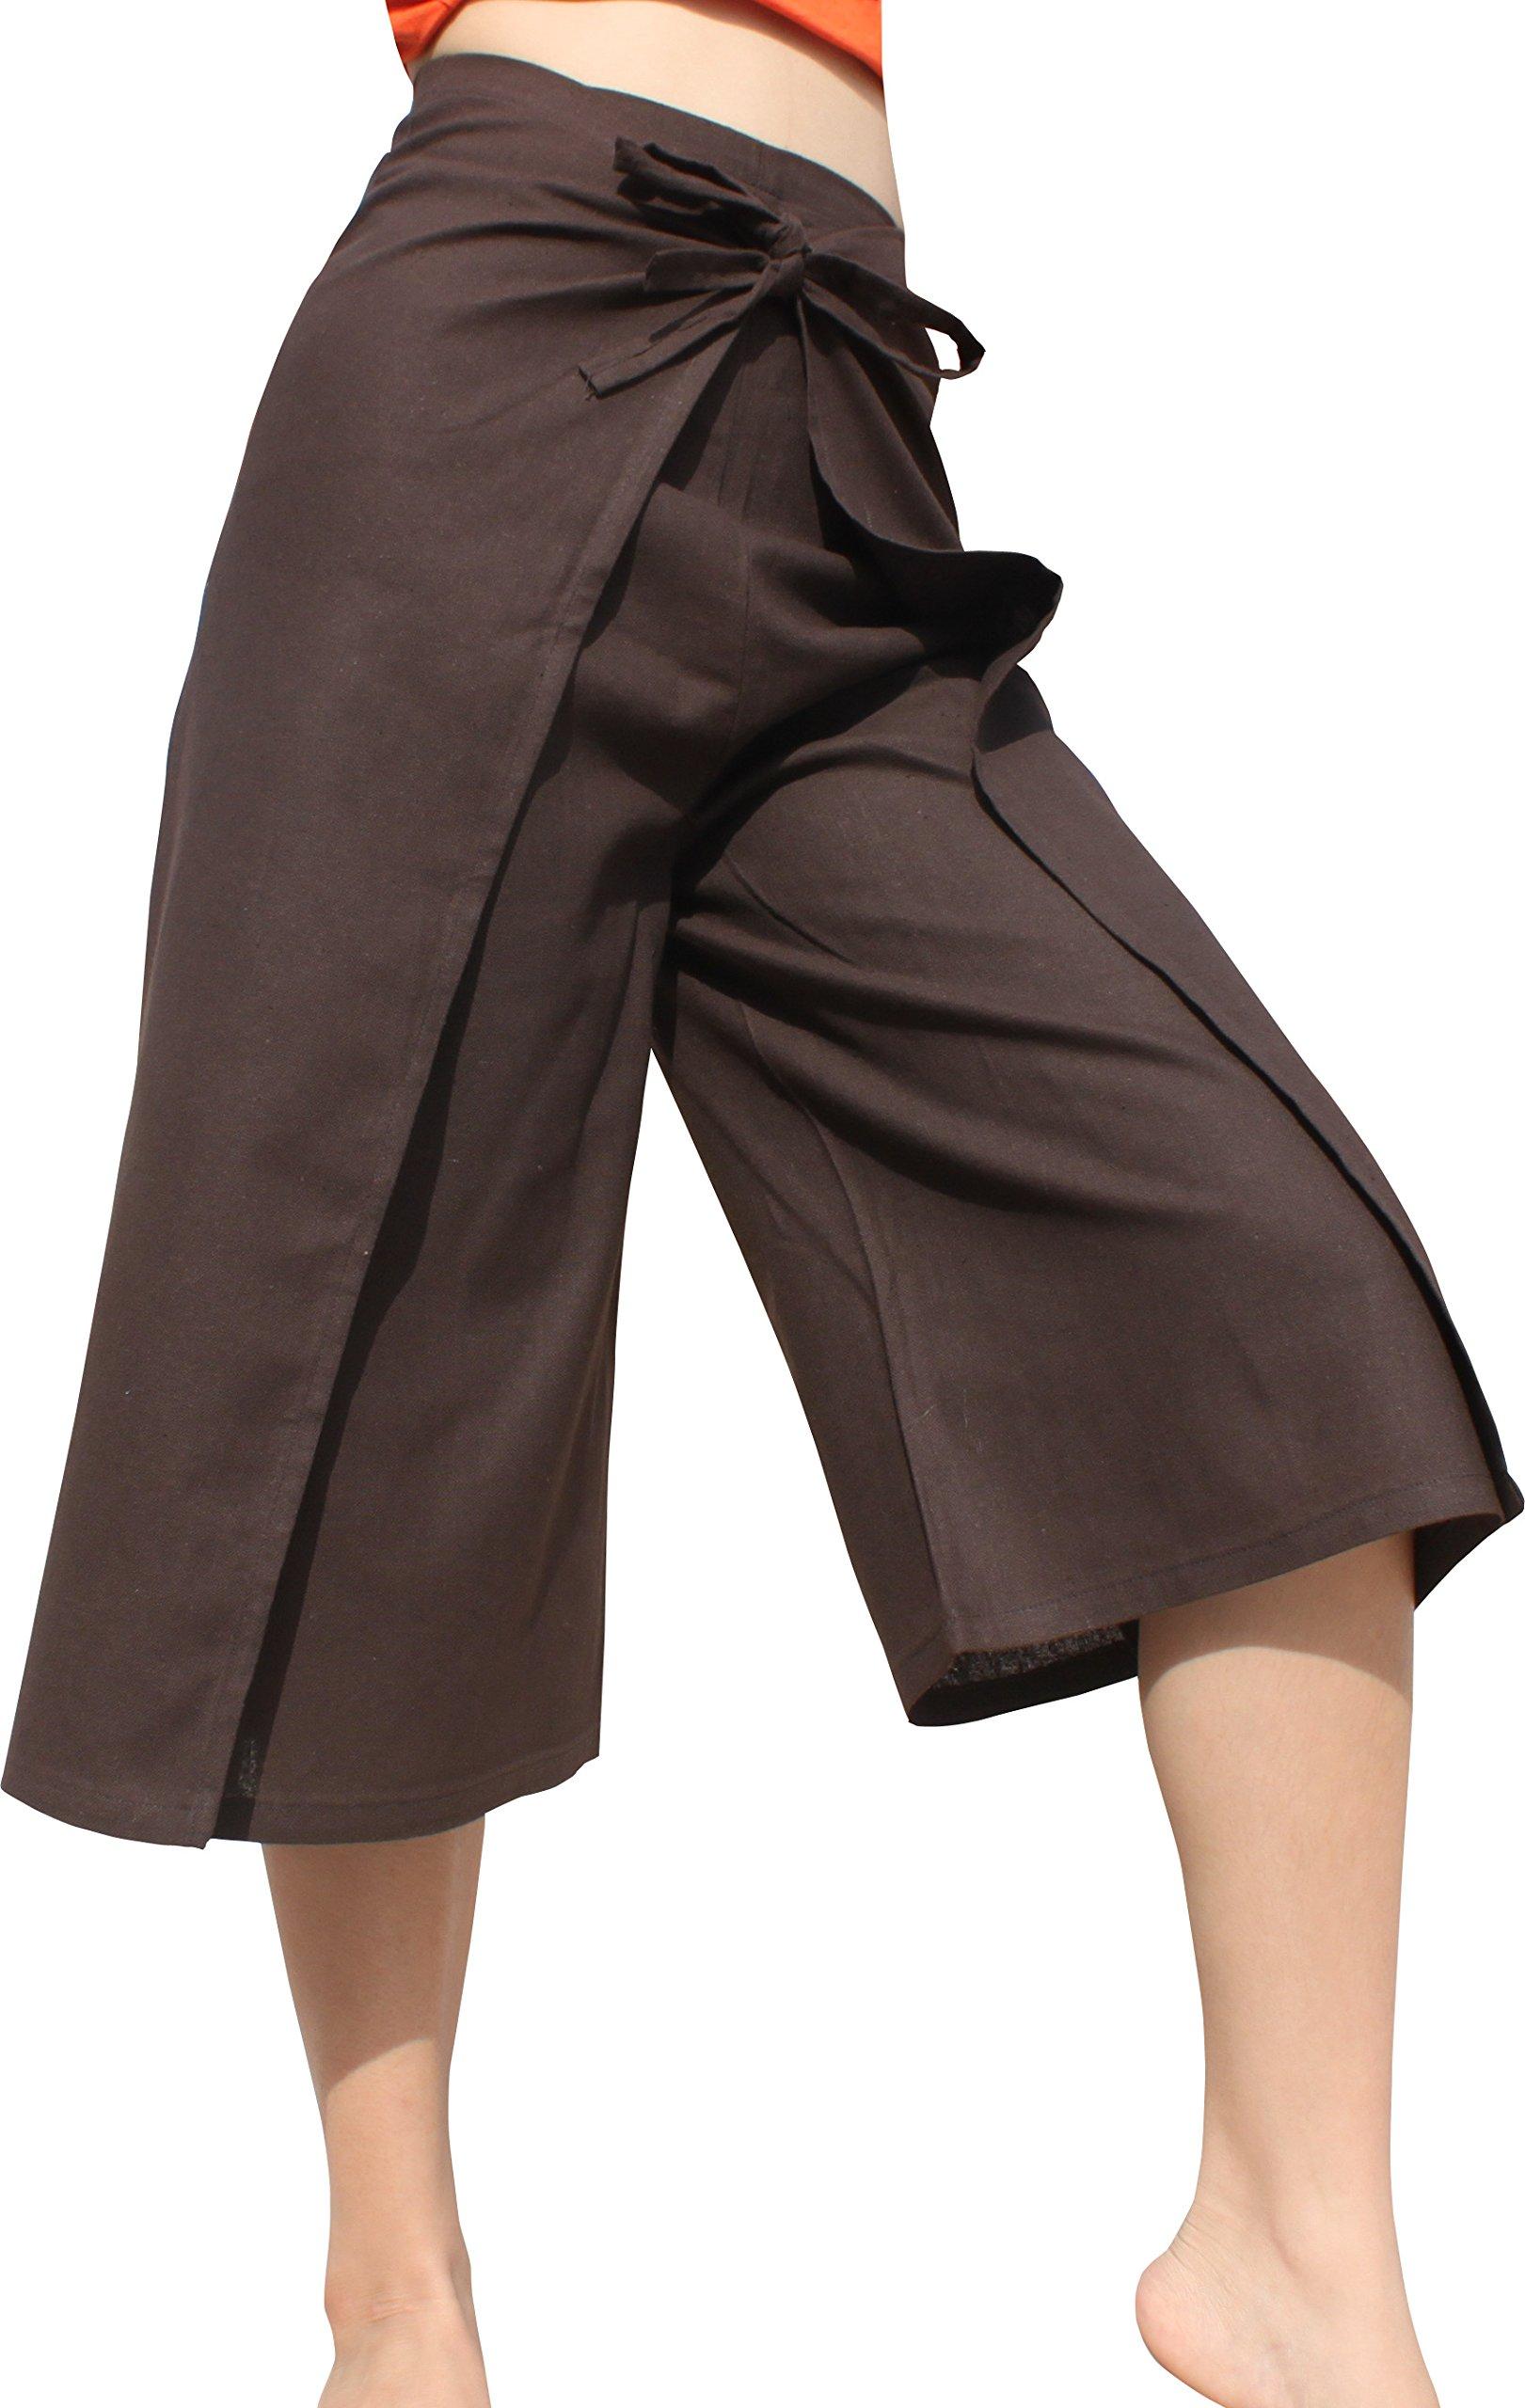 RaanPahMuang Drive In Wrap Pants In Summer Plain Mixed Cotton, Medium, Muang Bangkok Cotton - bistre Brown by RaanPahMuang